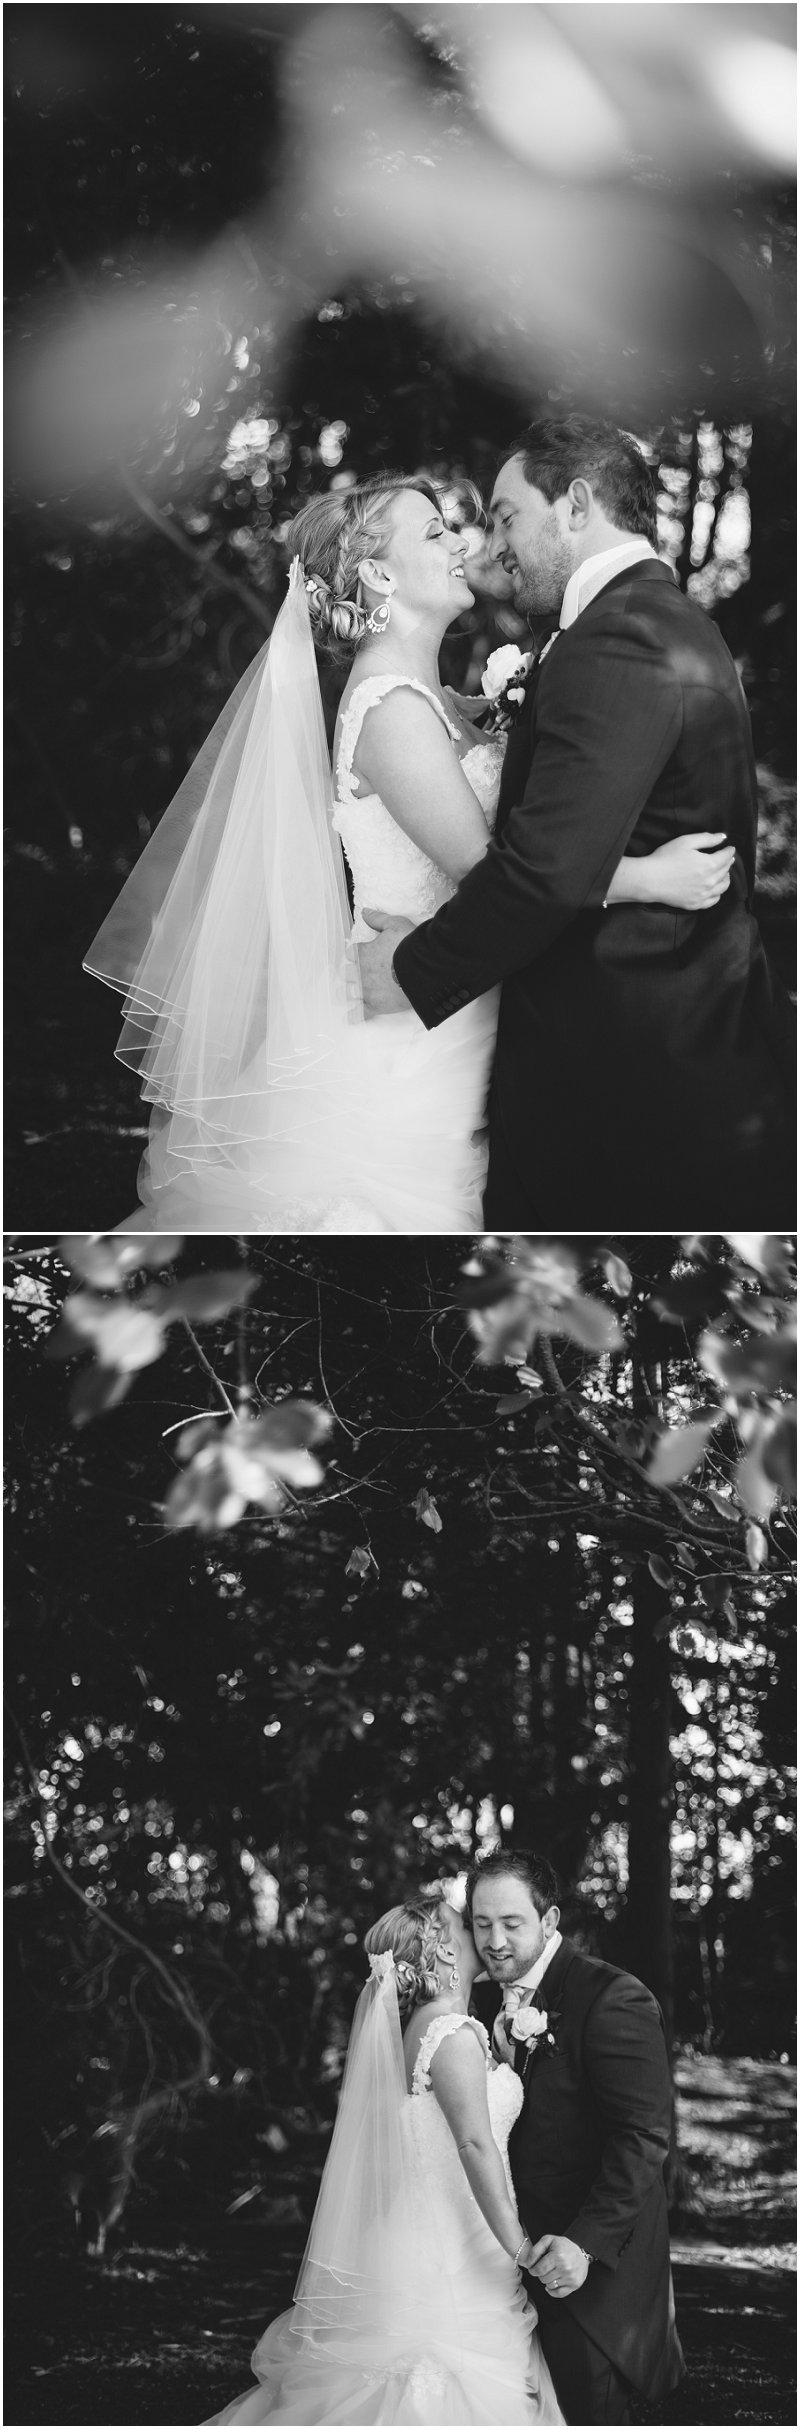 Beautiful Bride and Groom portraits Karli Harrison Photography